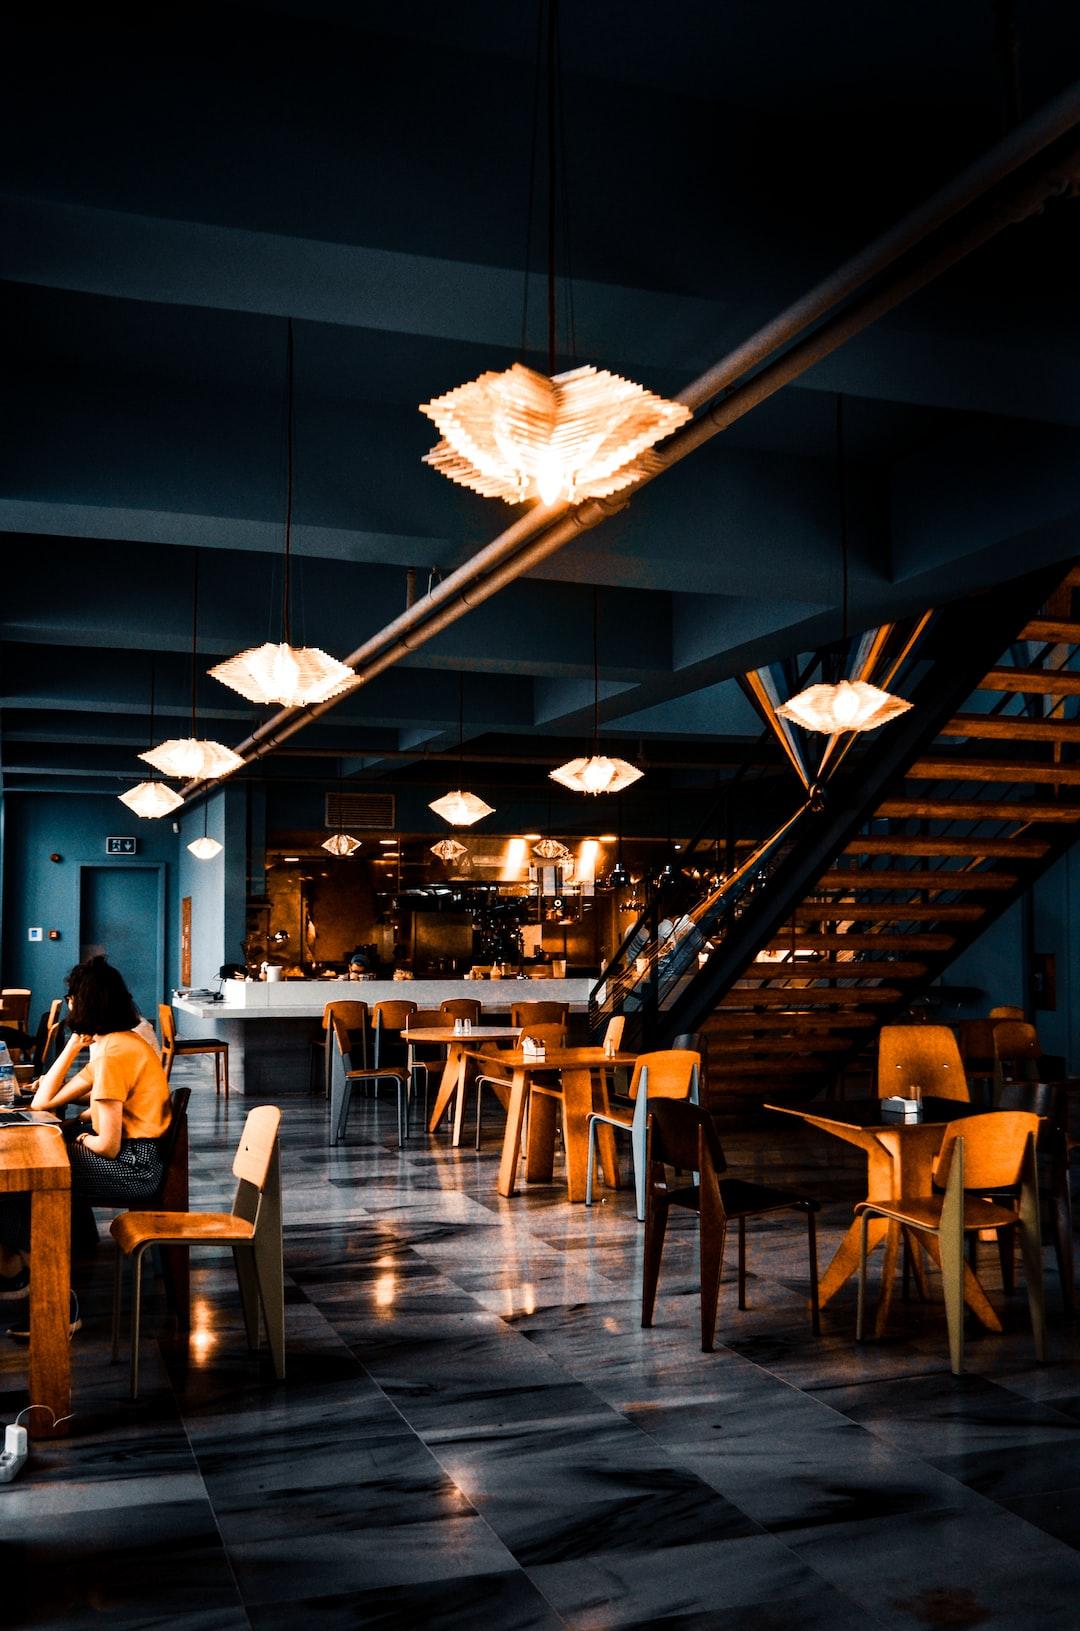 Restaurant Furniture for Orlando, Florida